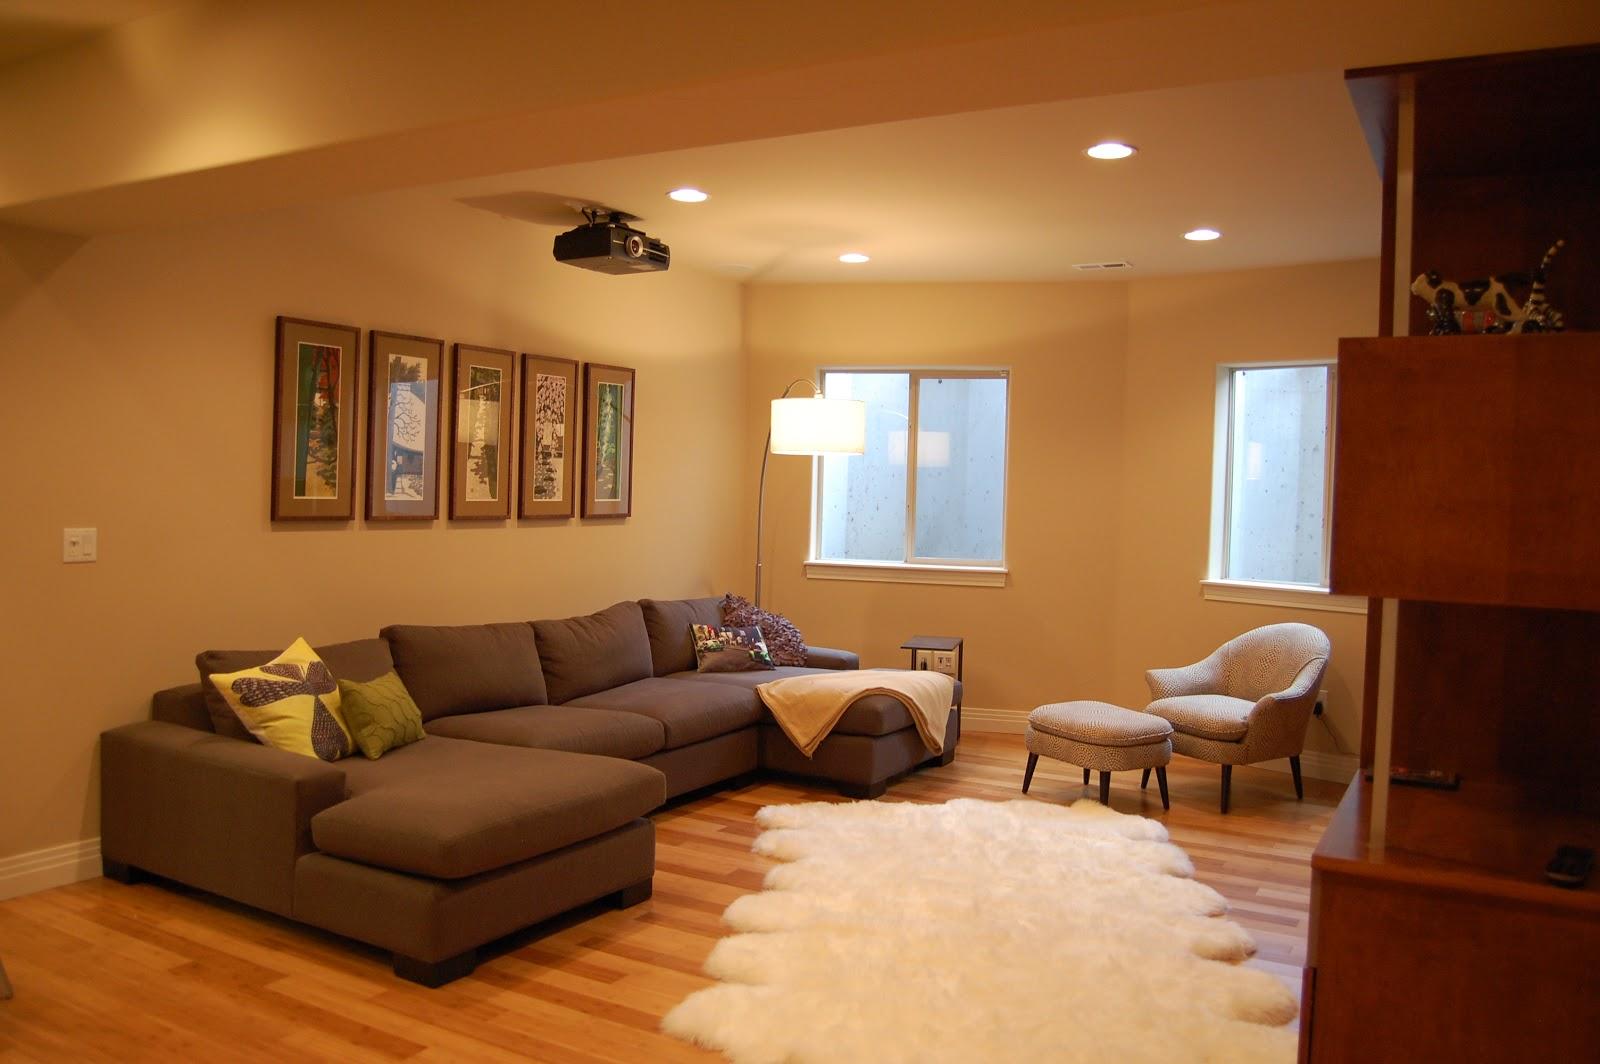 luxury basement furniture decoration ideas basement style interior